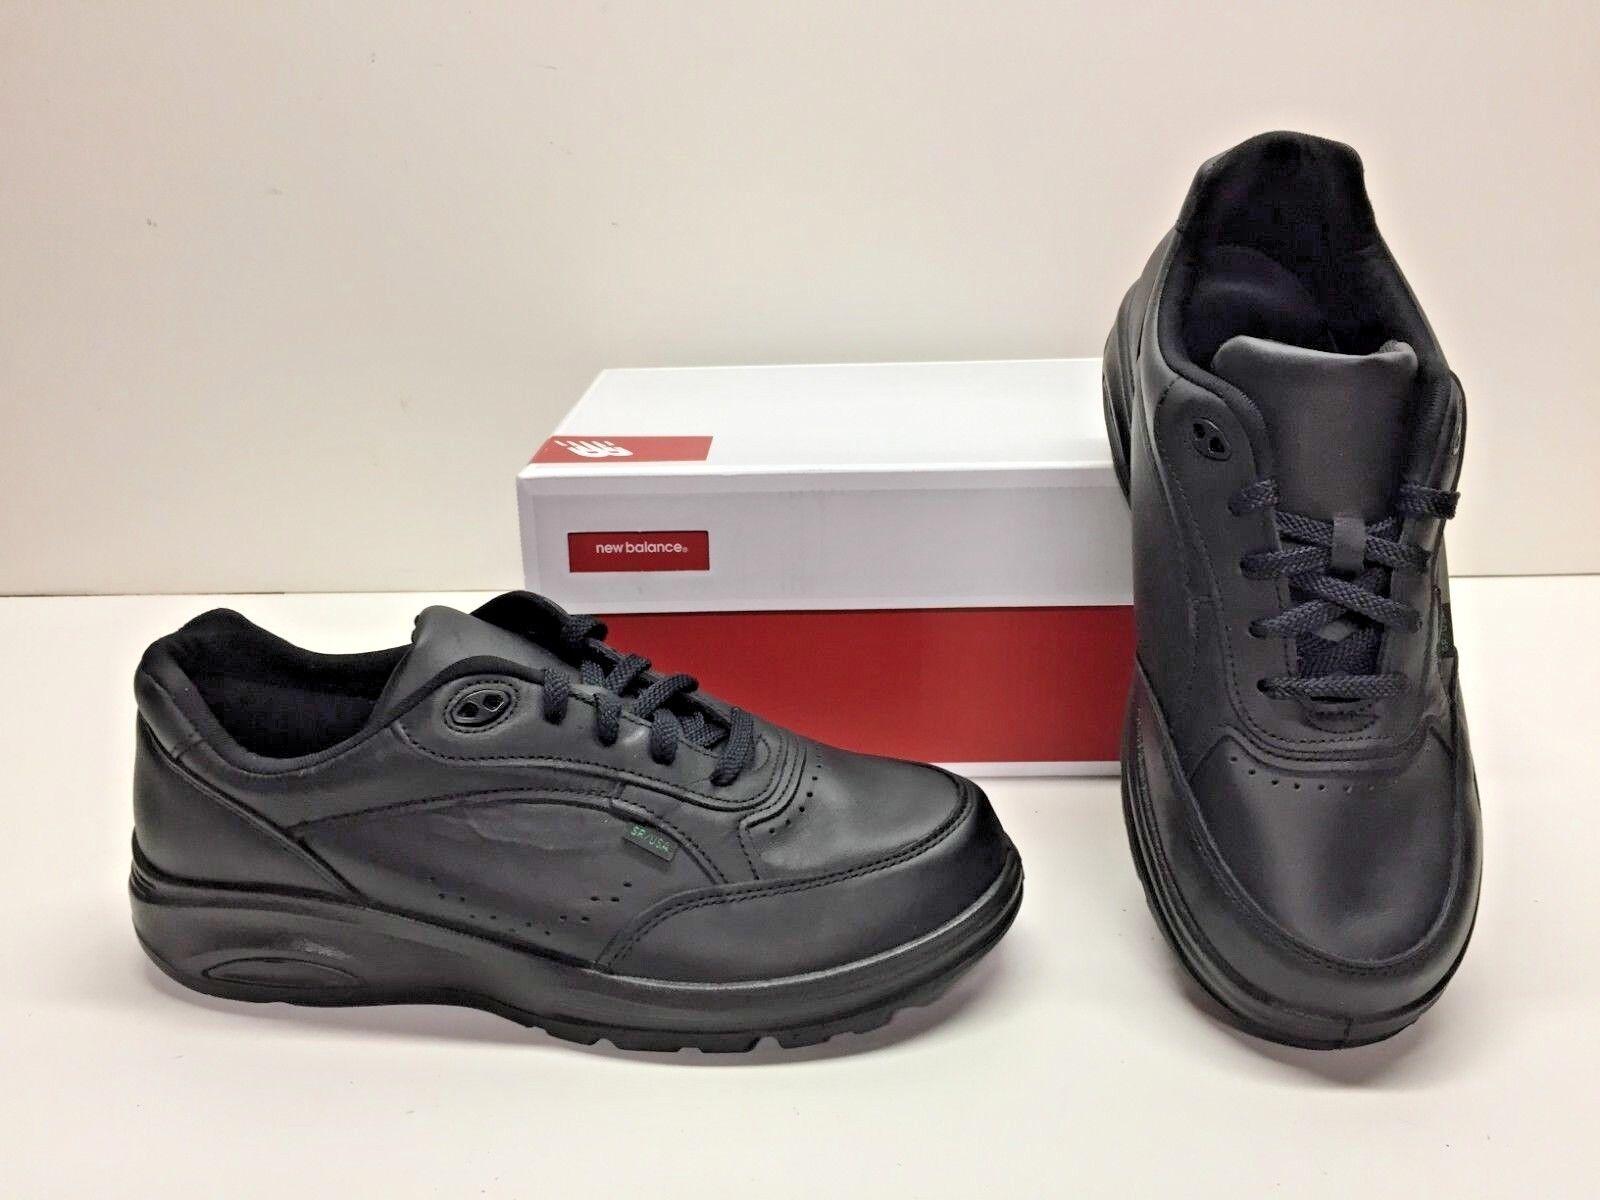 New Balance 706V2 Black US Postal Leather Walking shoes Mens 8.5 4E Extra Wide